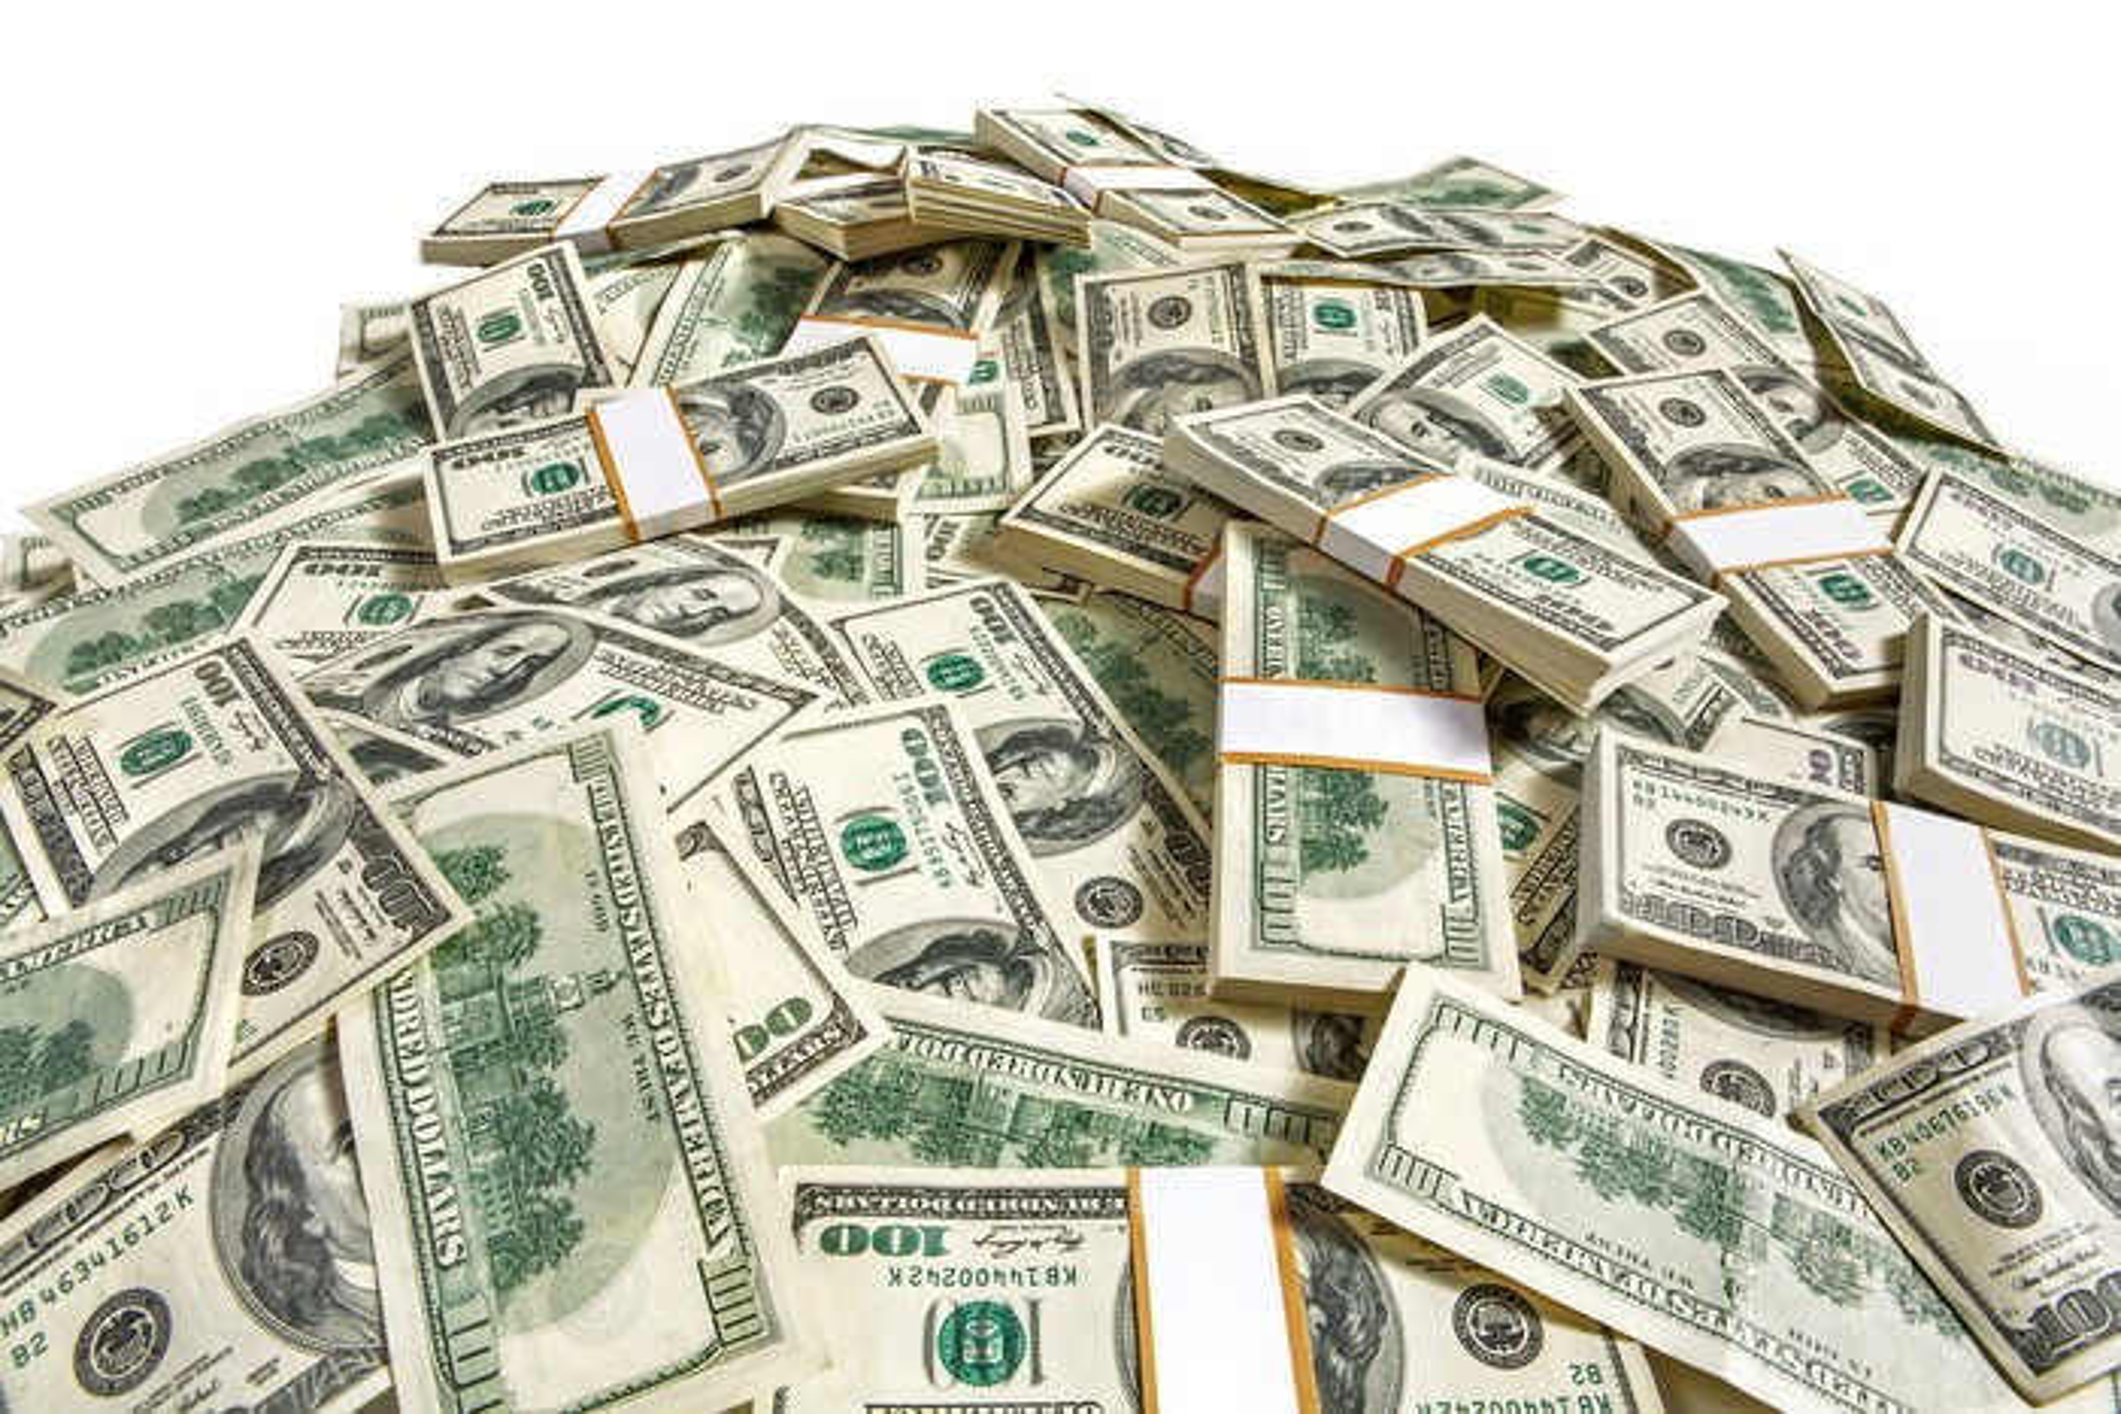 Pile of bundles of 100 dollar bills.